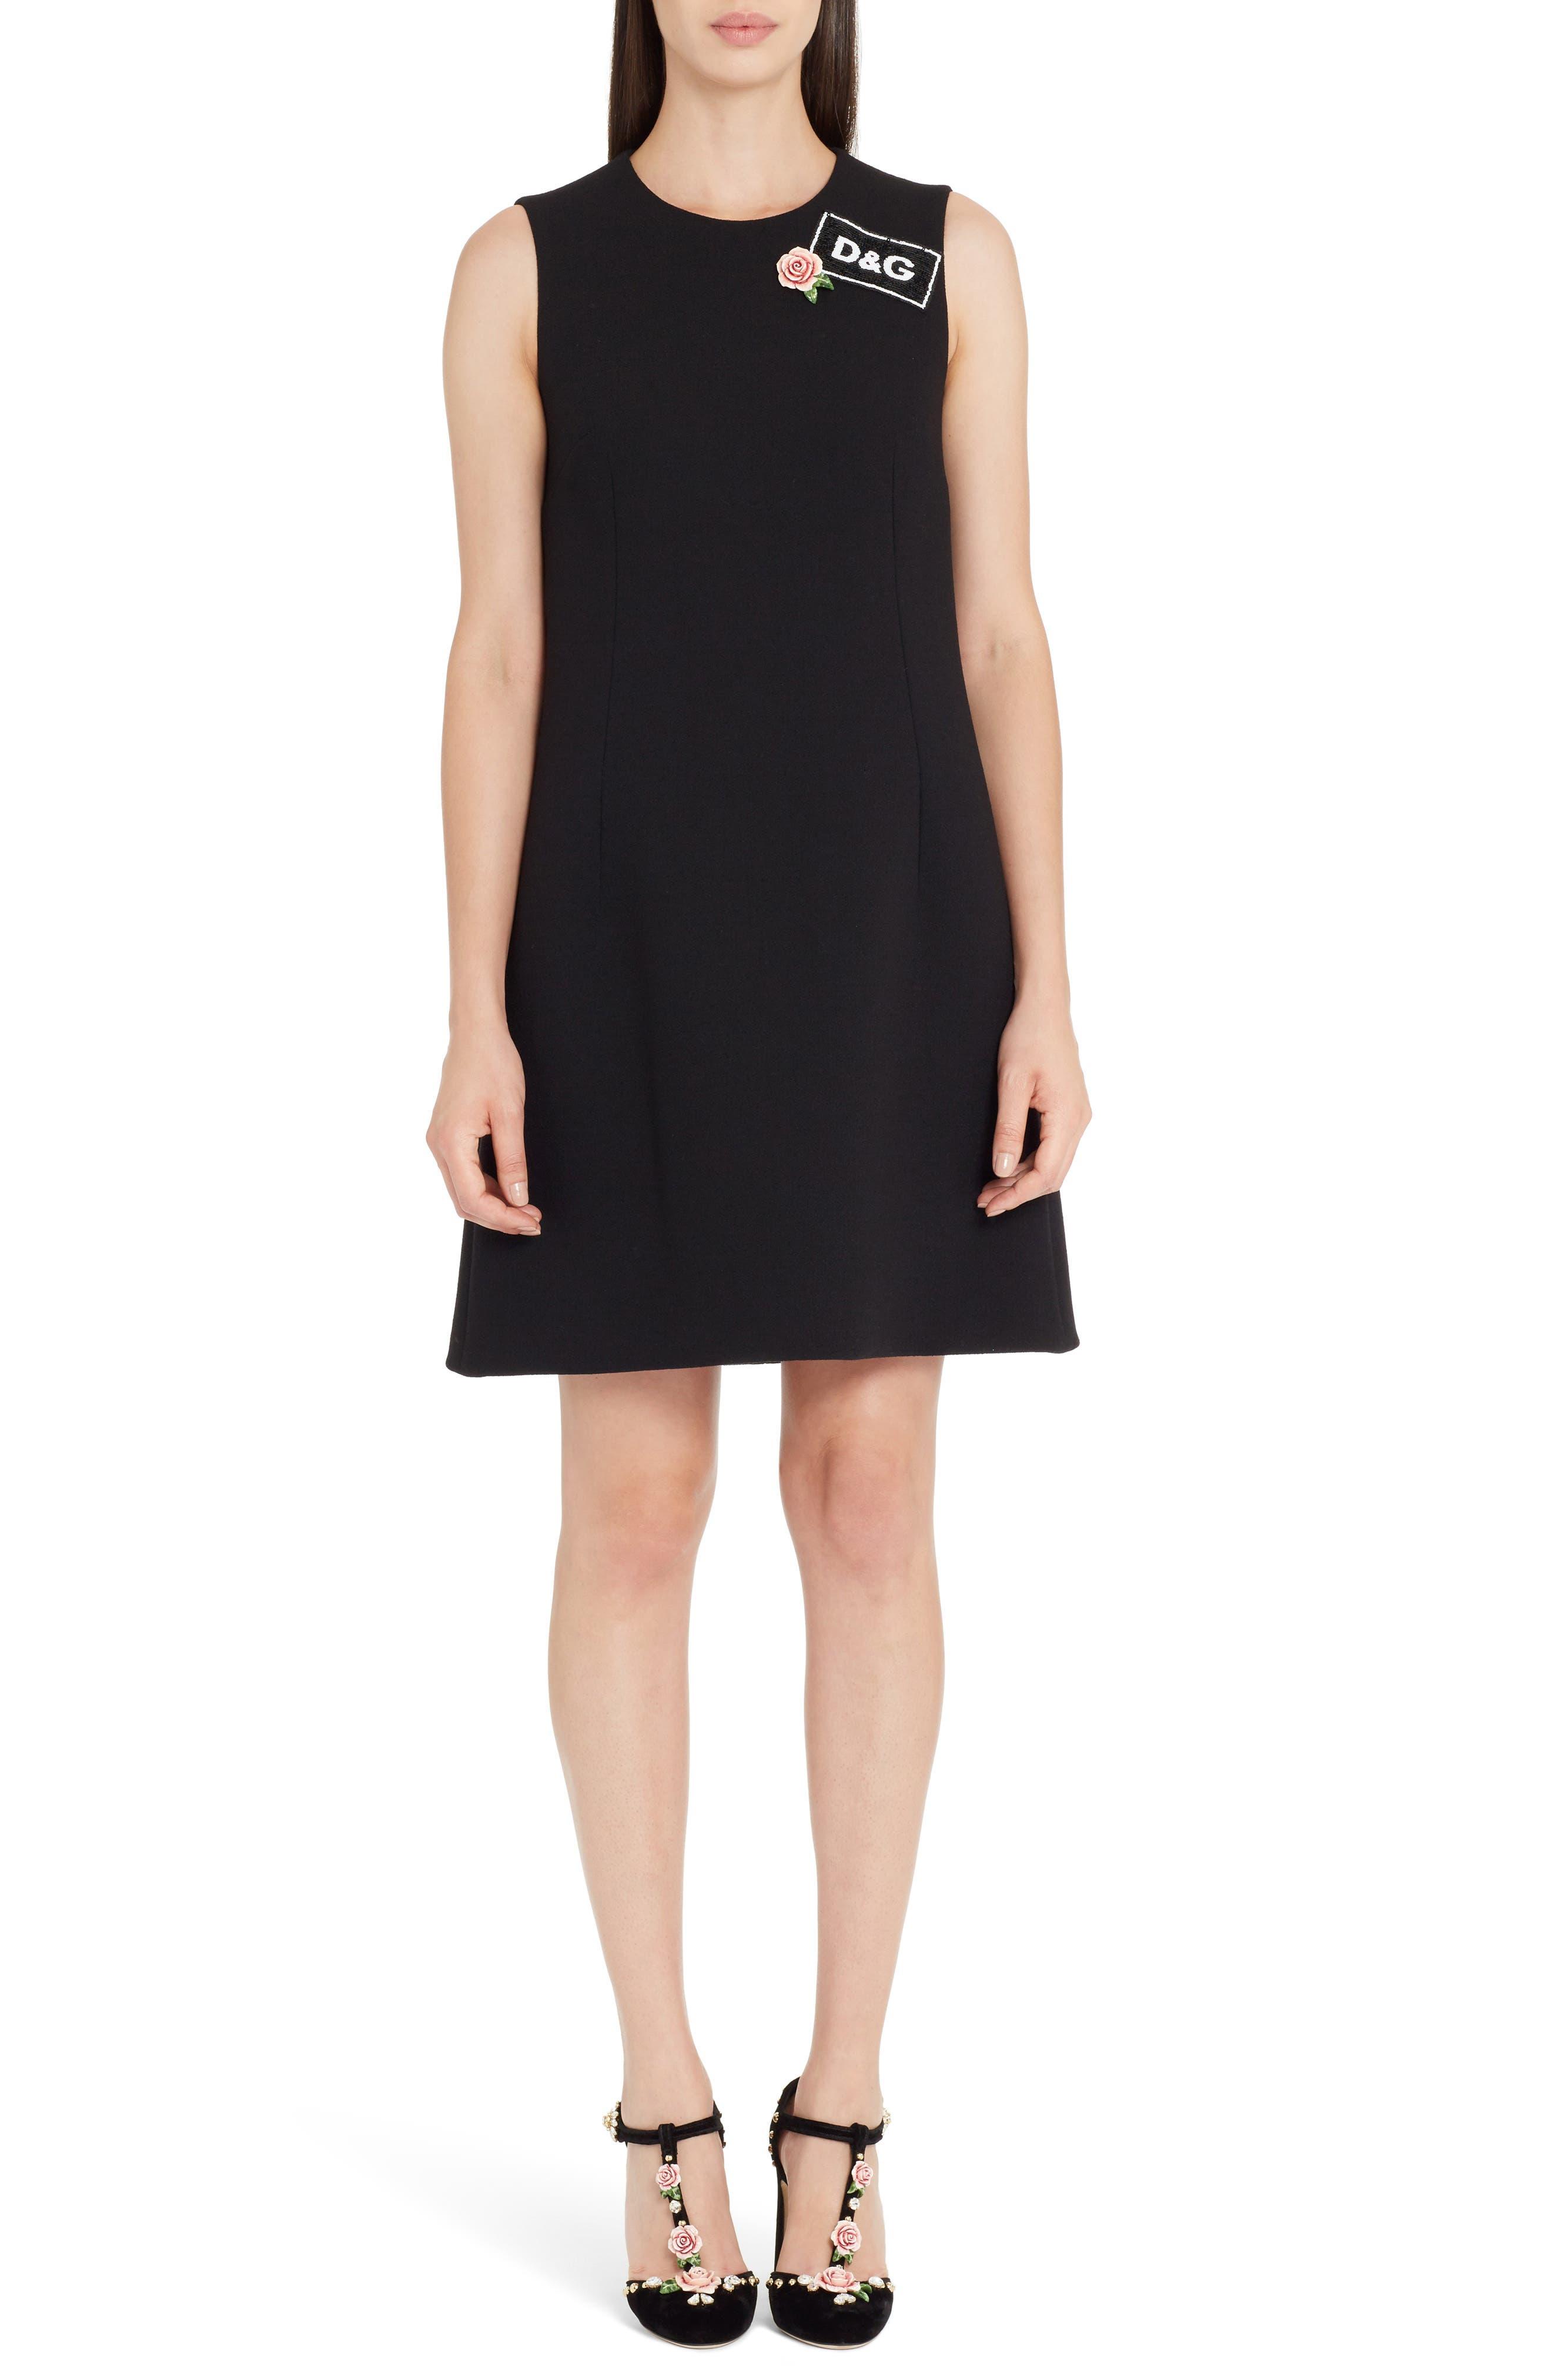 Dolce & gabbana Sequin Logo Crepe A-Line Dress, 8 IT - Black